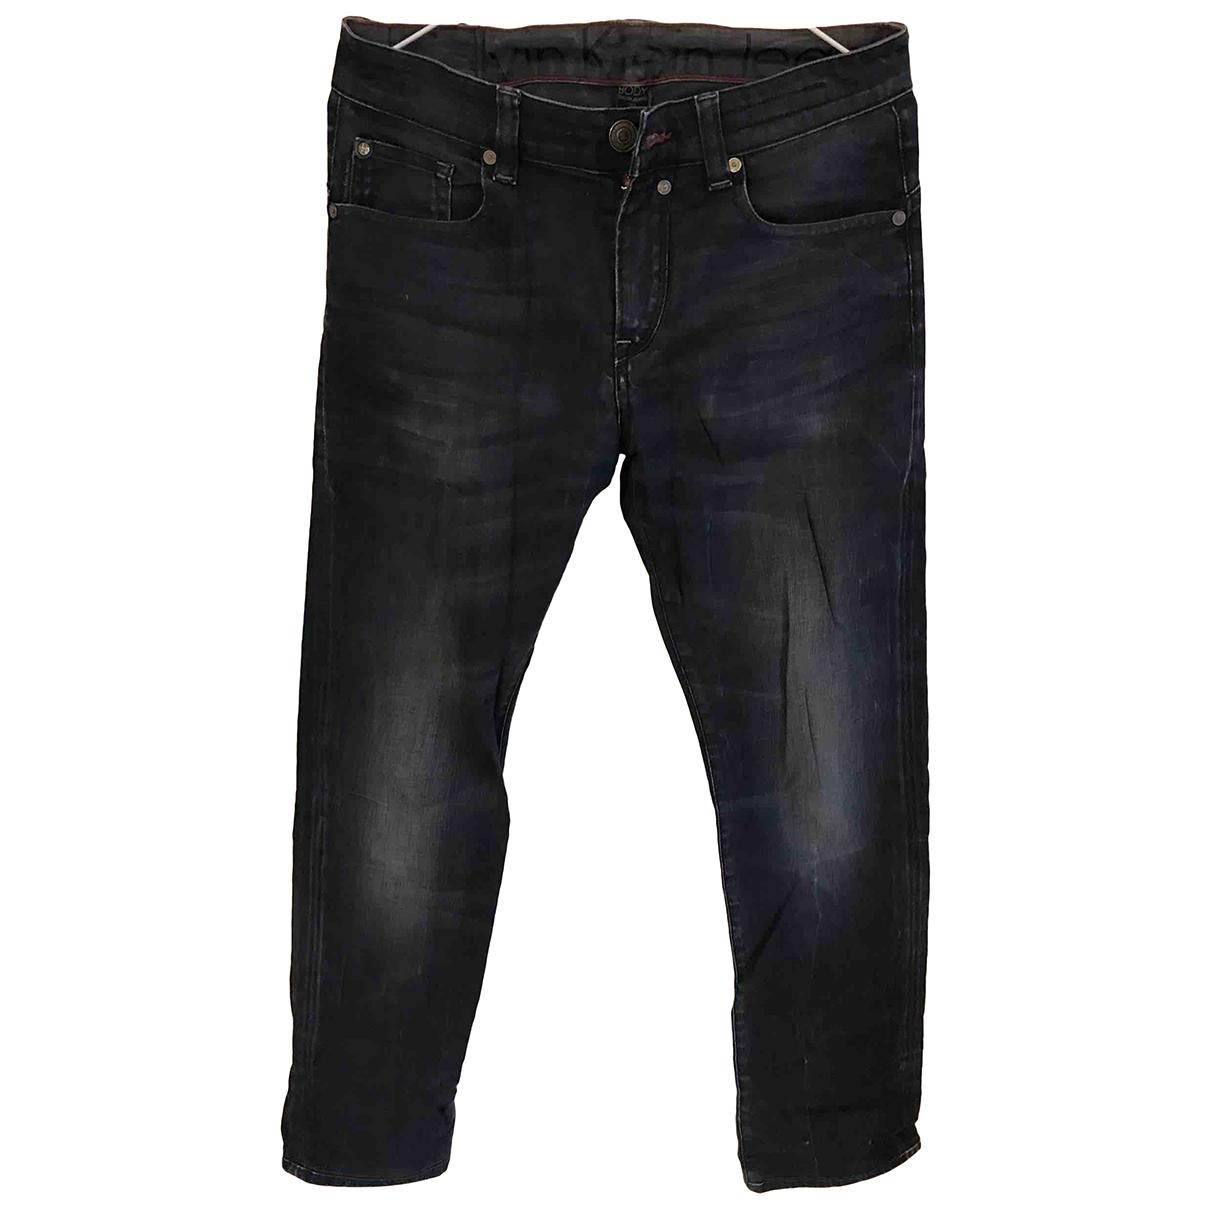 Calvin Klein \N Blue Cotton Jeans for Men 30 UK - US